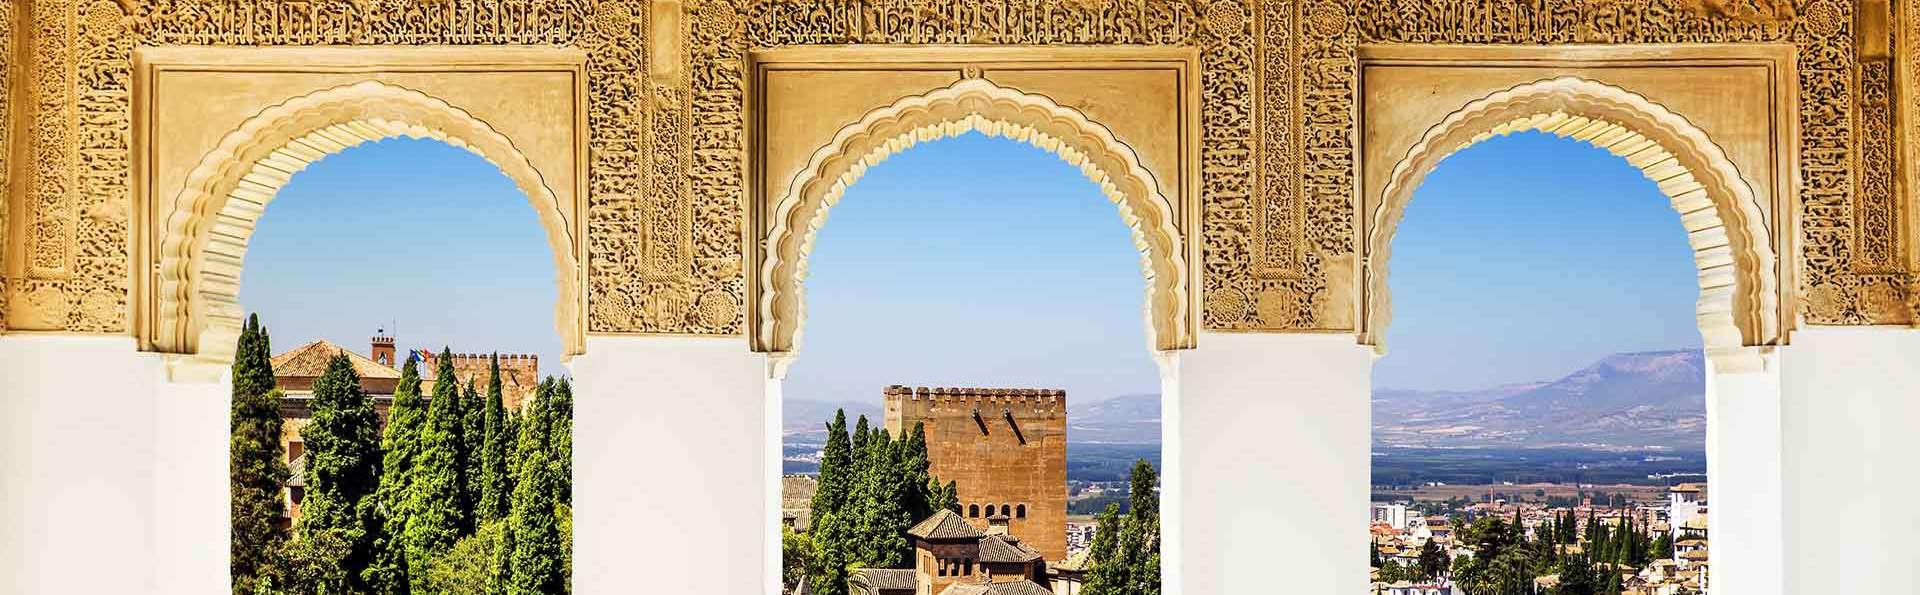 Hotel Alhambra Palace - EDIT_GRANADA.jpg